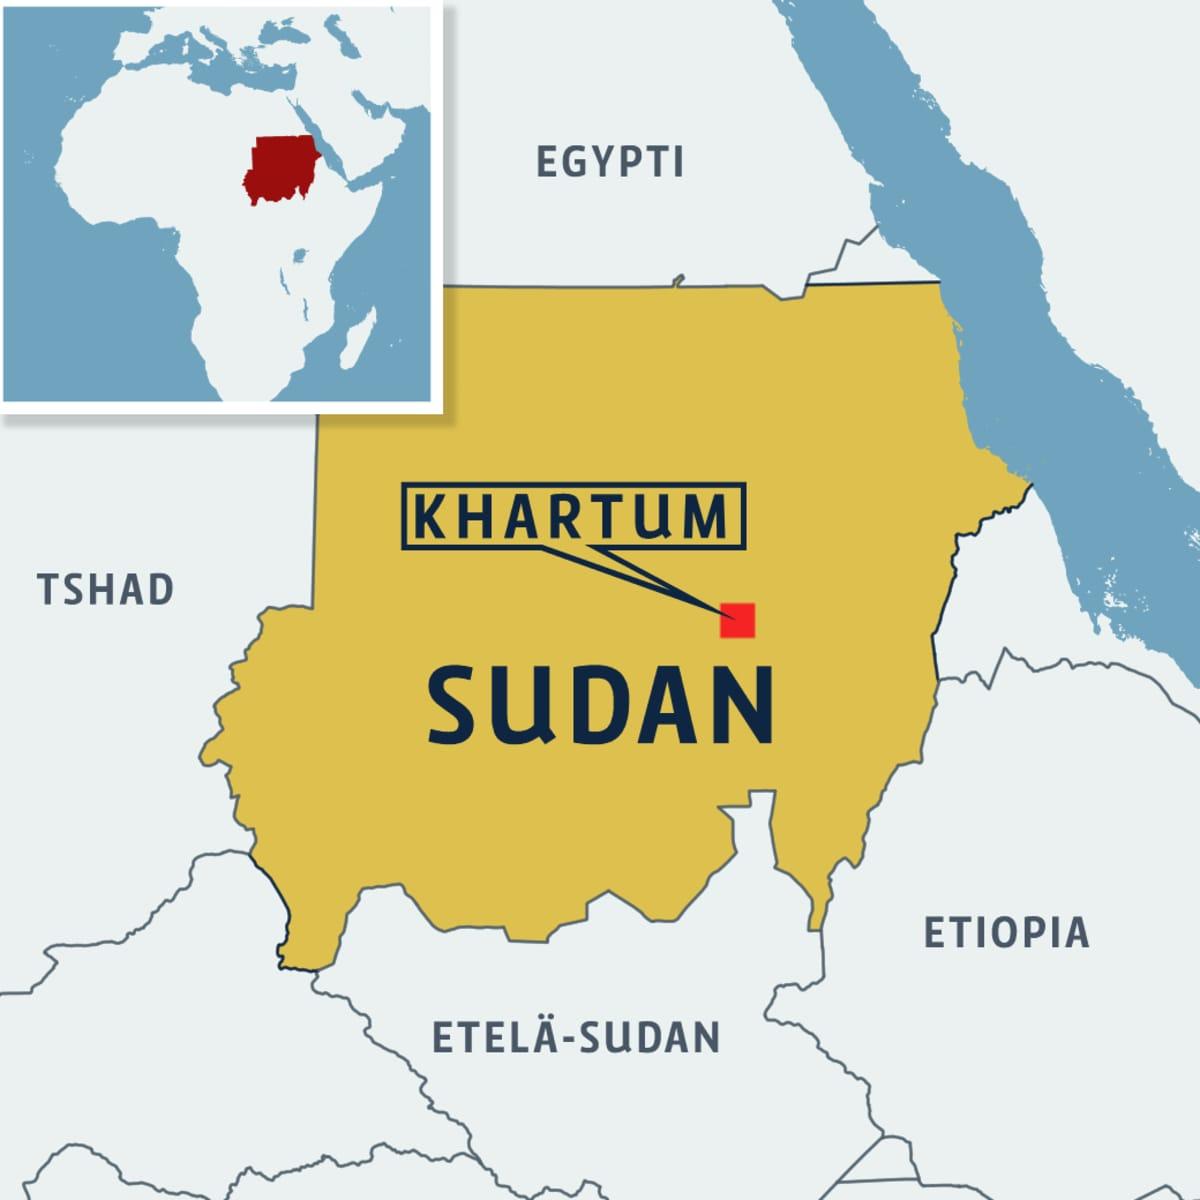 Kartta: sudan, Khartum ja naapurimaita